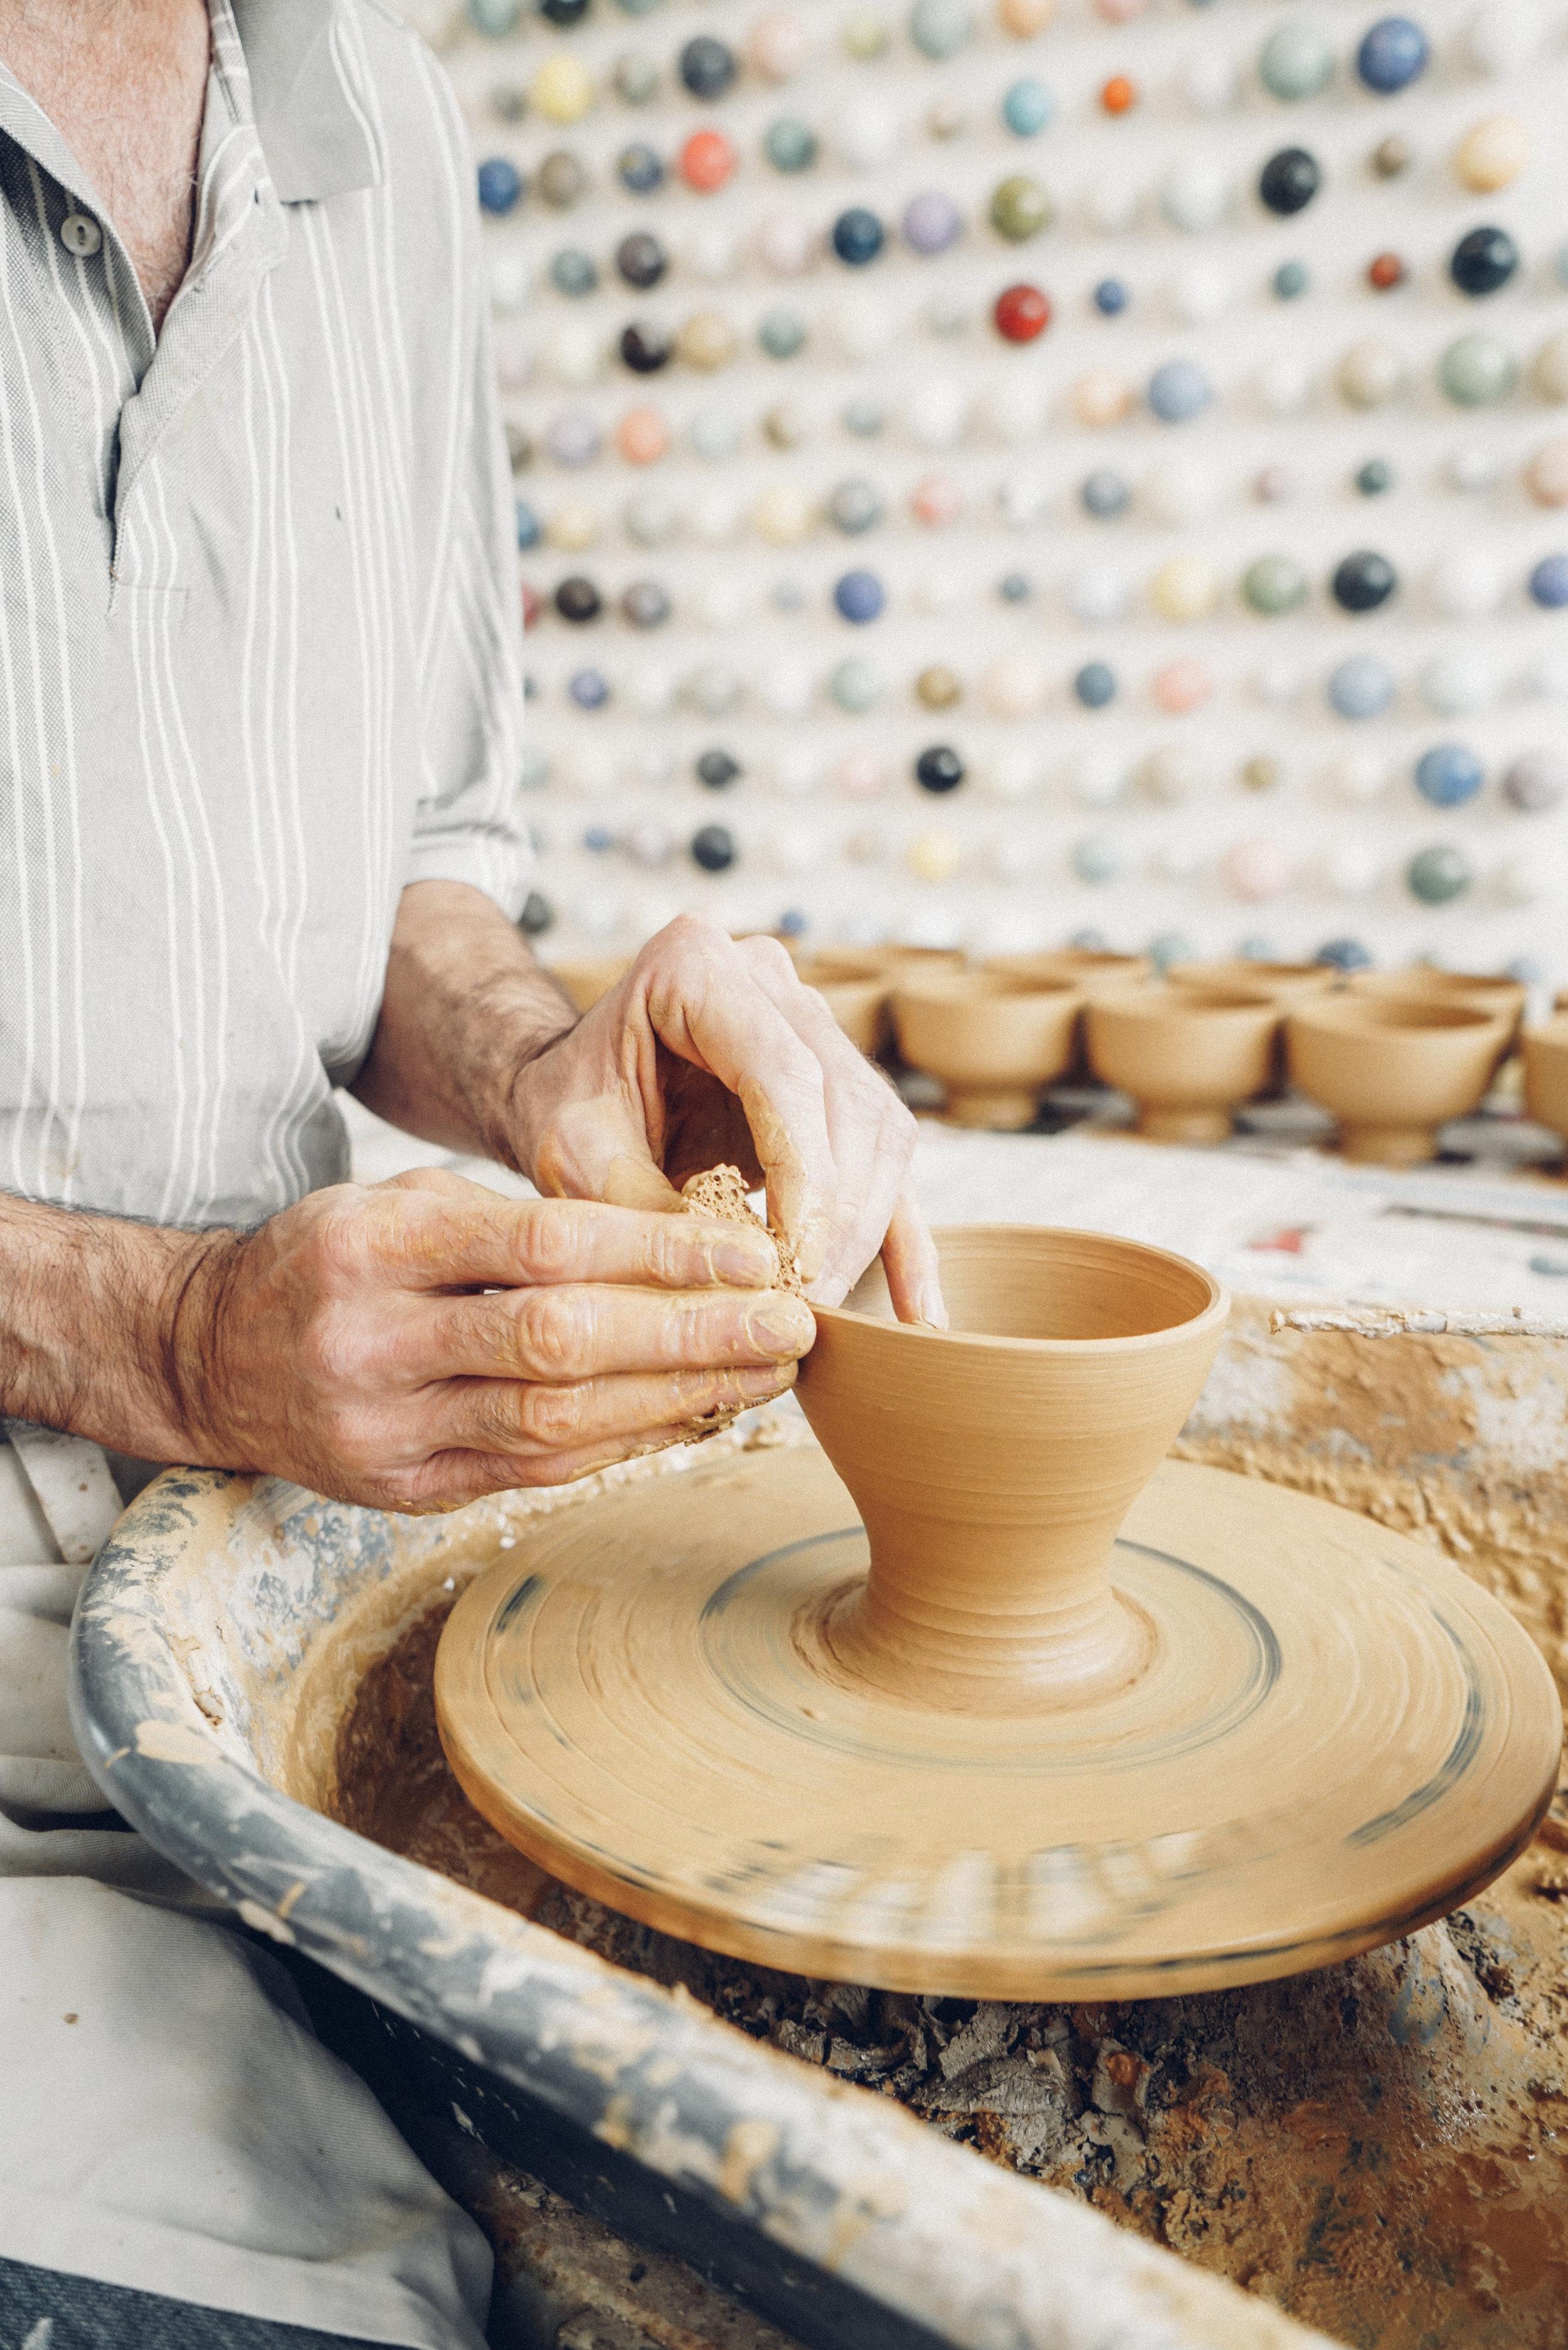 Studio Arhoj ceramist throwing a bowl